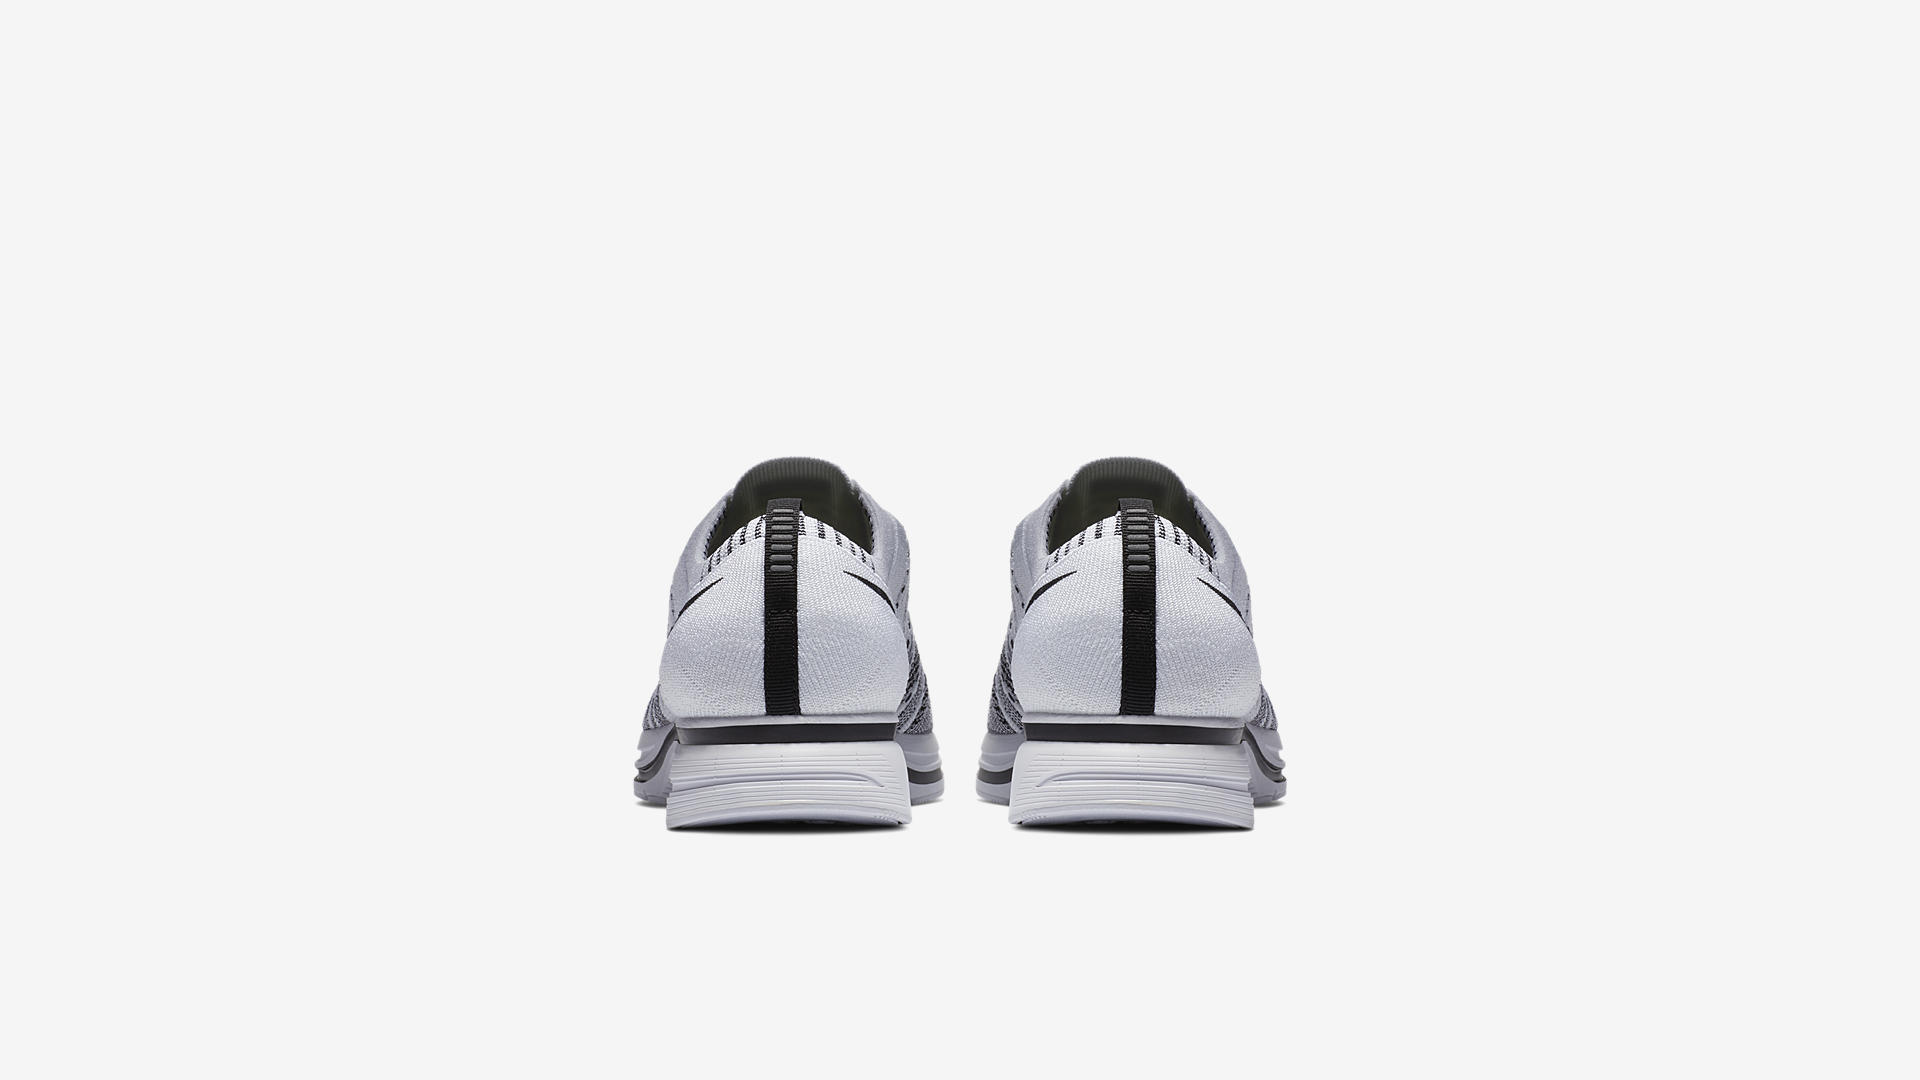 AH8396 100 Nike Flyknit Trainer White Black 2